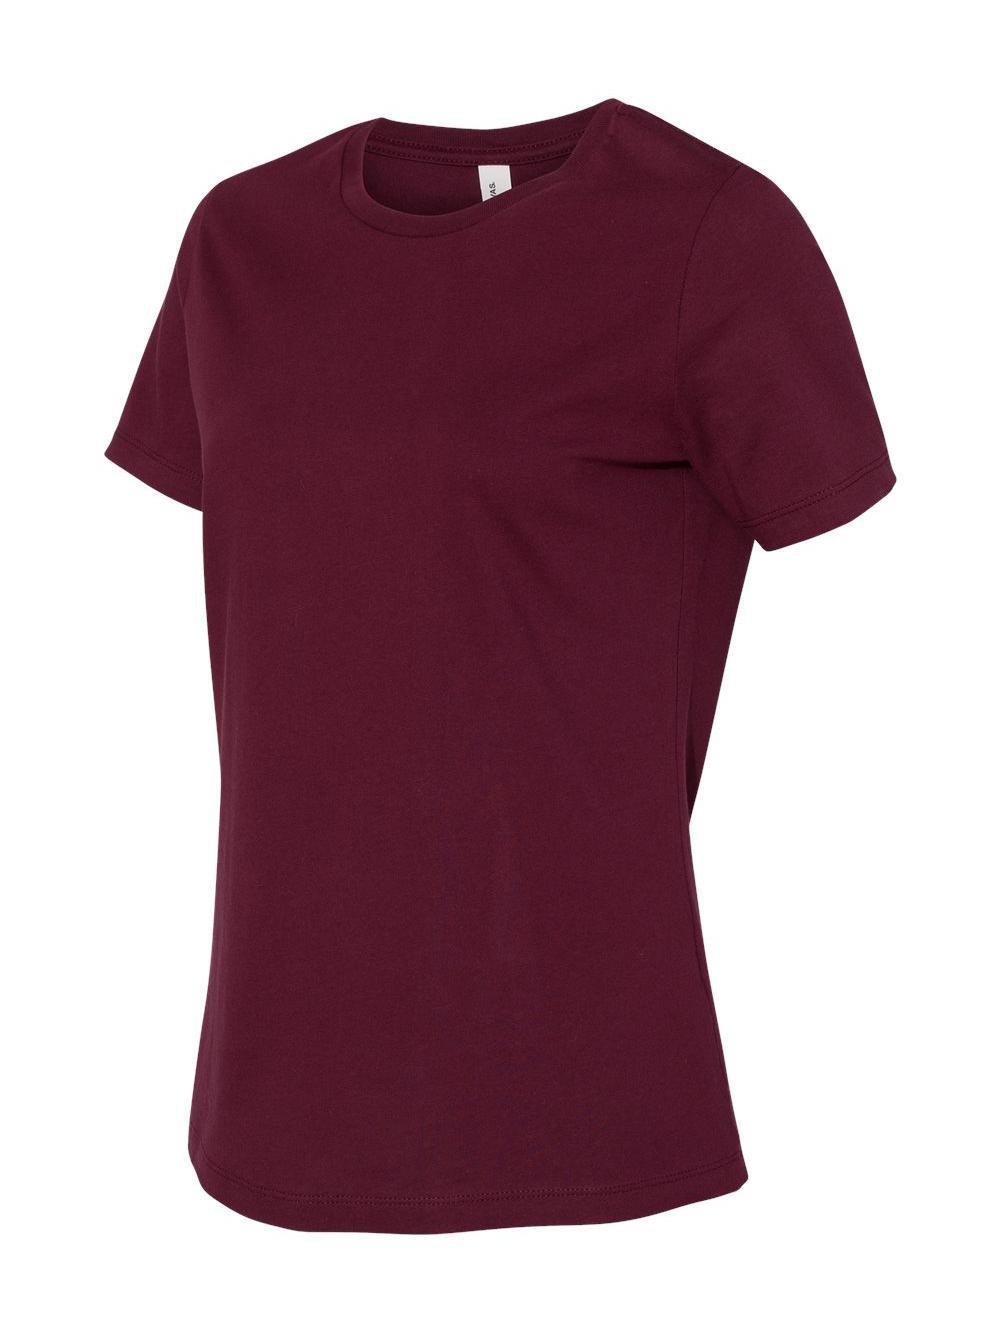 Bella-Canvas-Women-039-s-Relaxed-Short-Sleeve-Jersey-Tee-6400 thumbnail 47